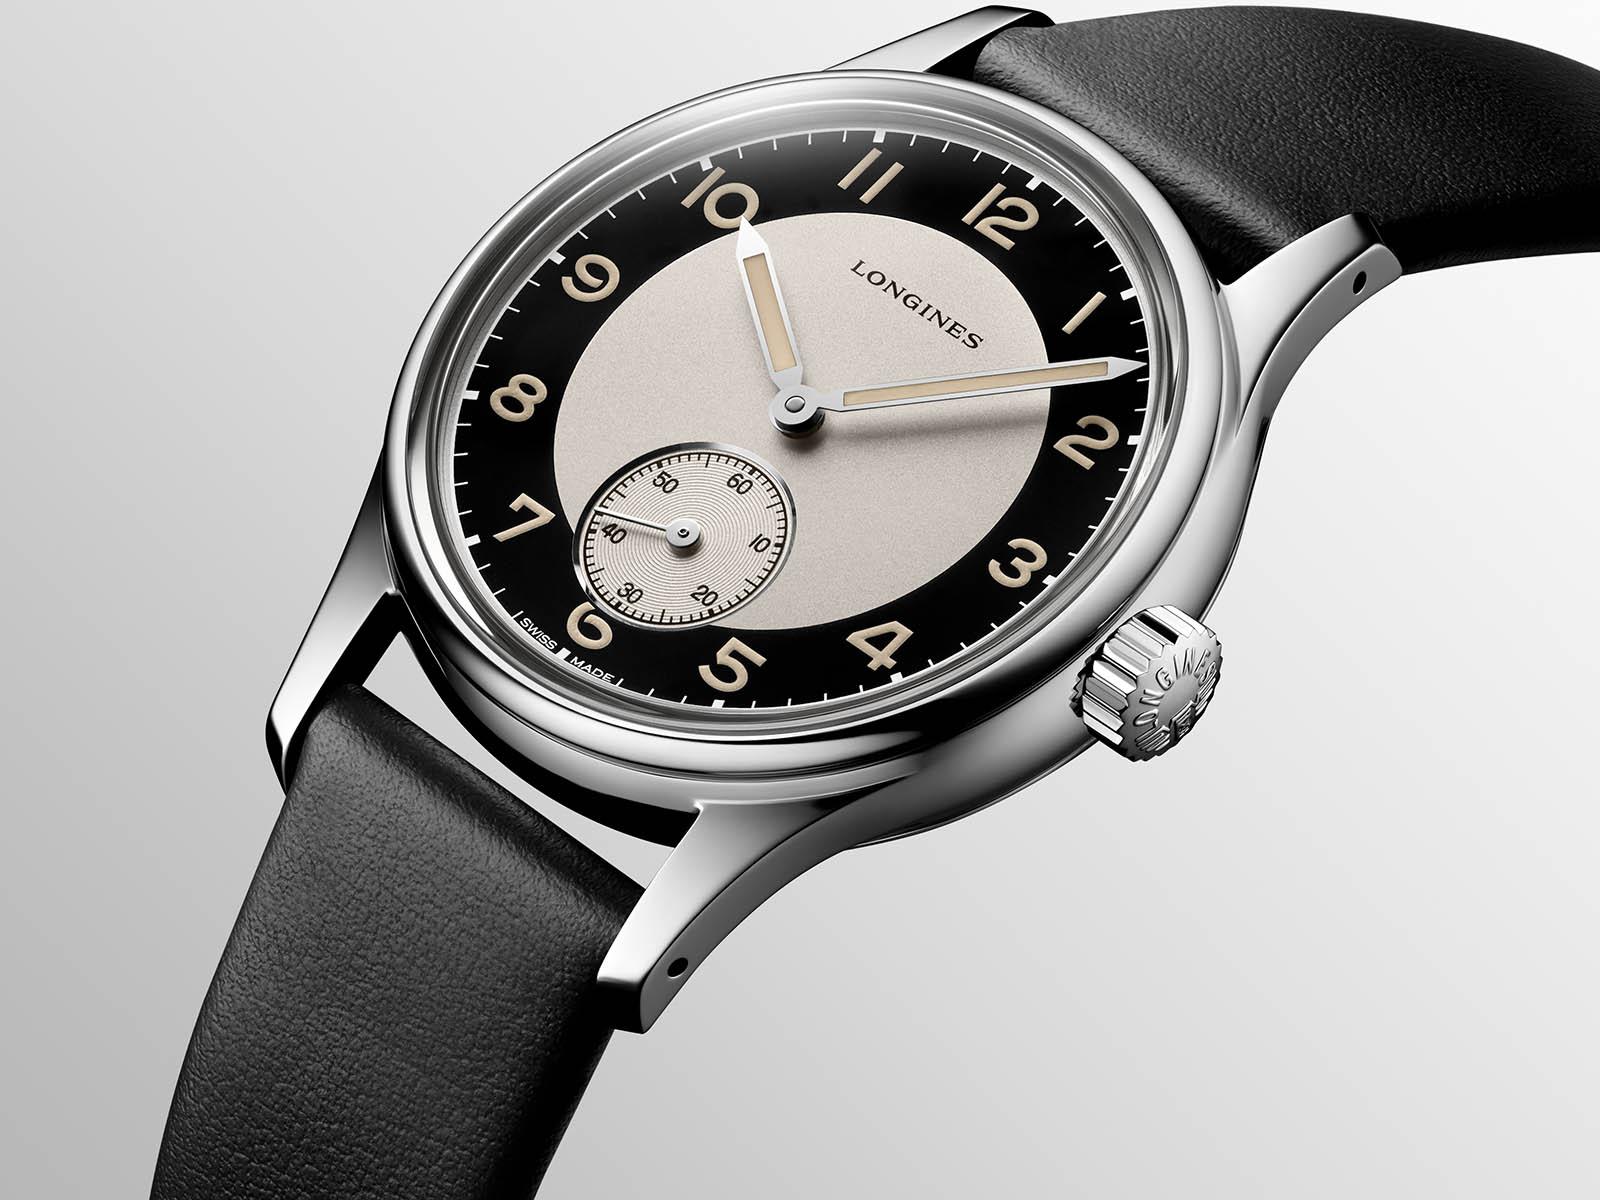 l2-330-4-93-0-longines-heritage-classic-tuxedo-6.jpg